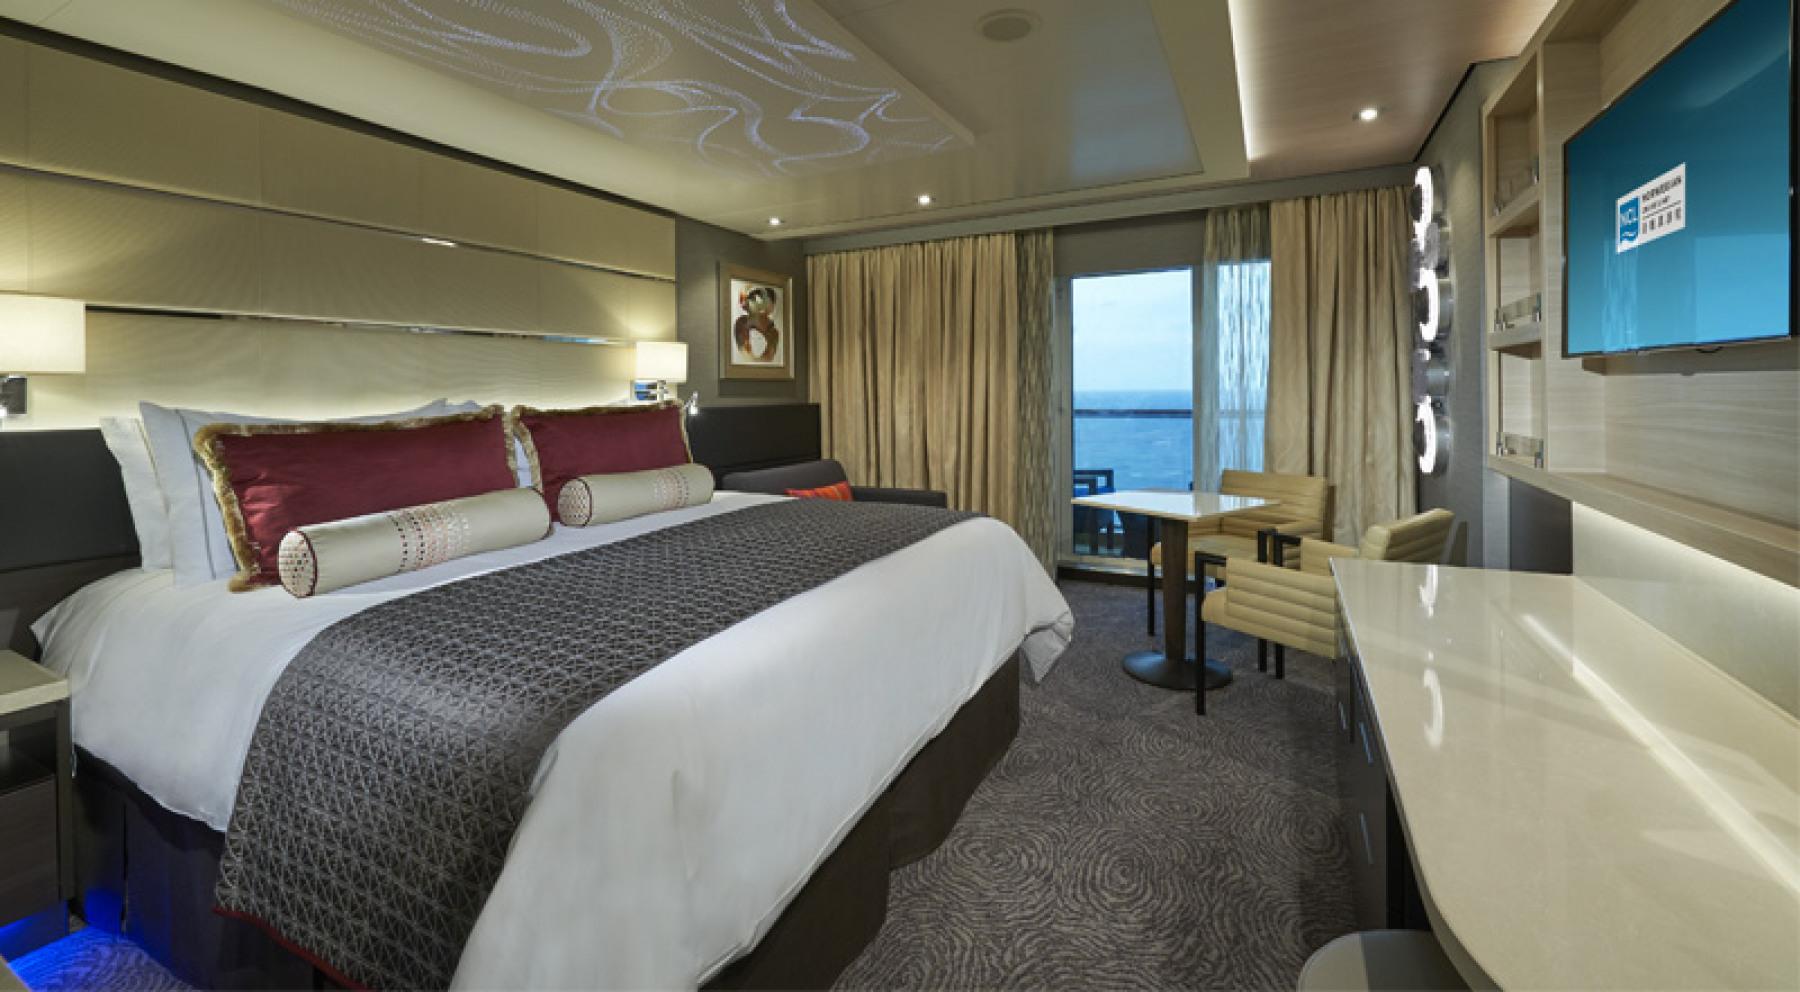 Norwegian Cruise Lines Norwegian Joy Accommodation The Haven Courtyard Suite.jpg